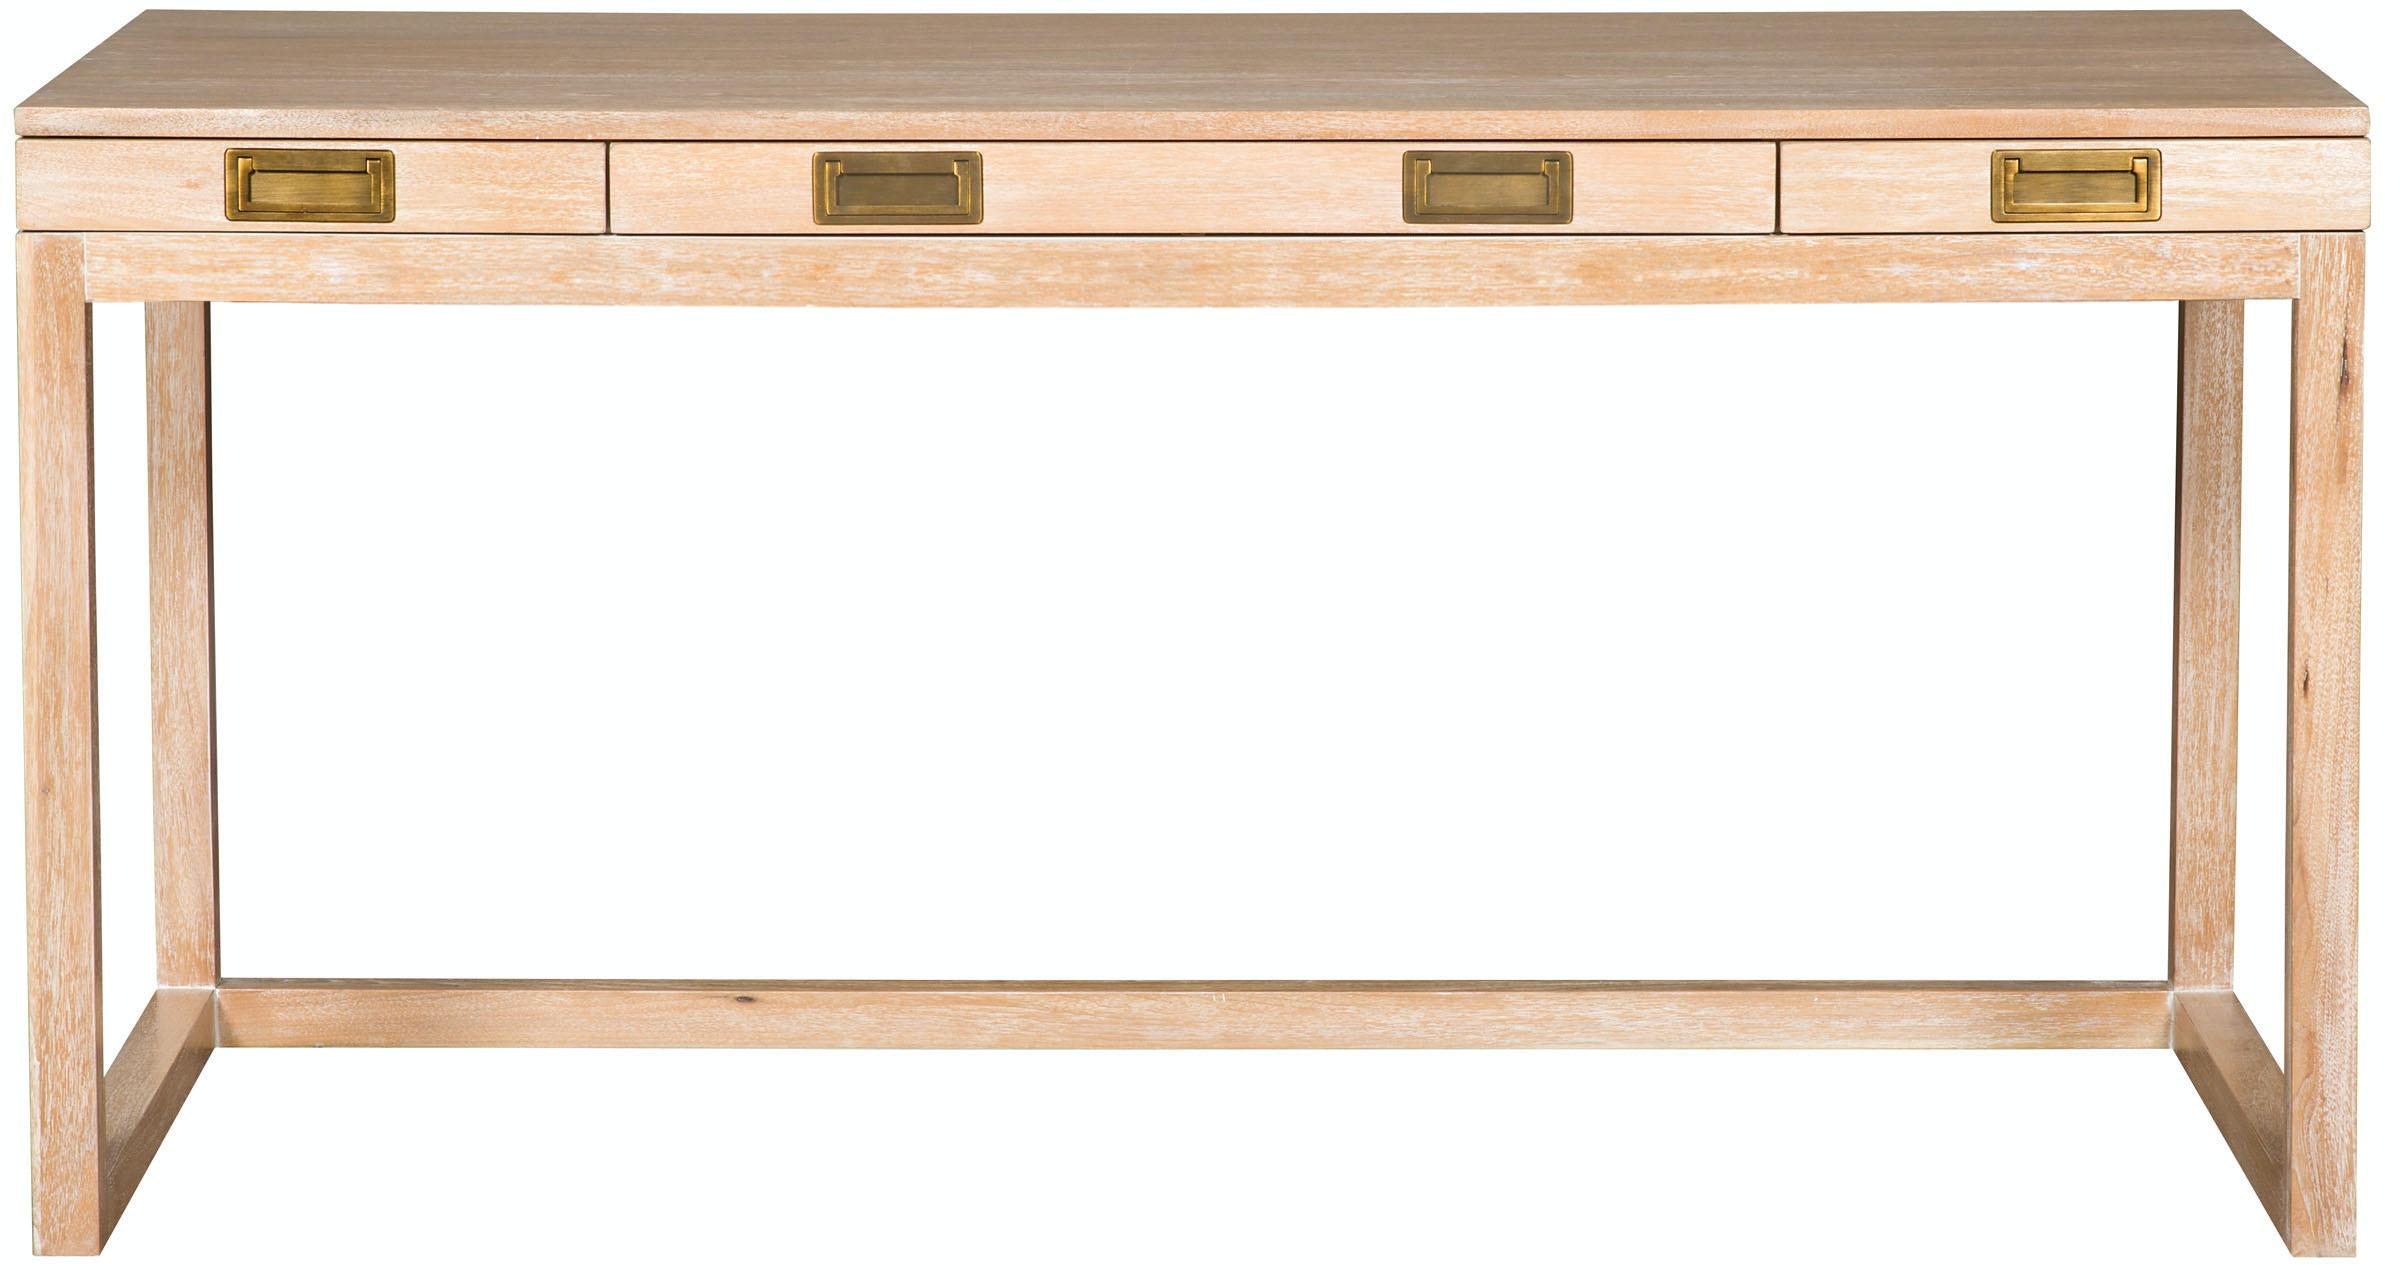 Vanguard Furniture Home Office Colgate Desk 9504dk Louis